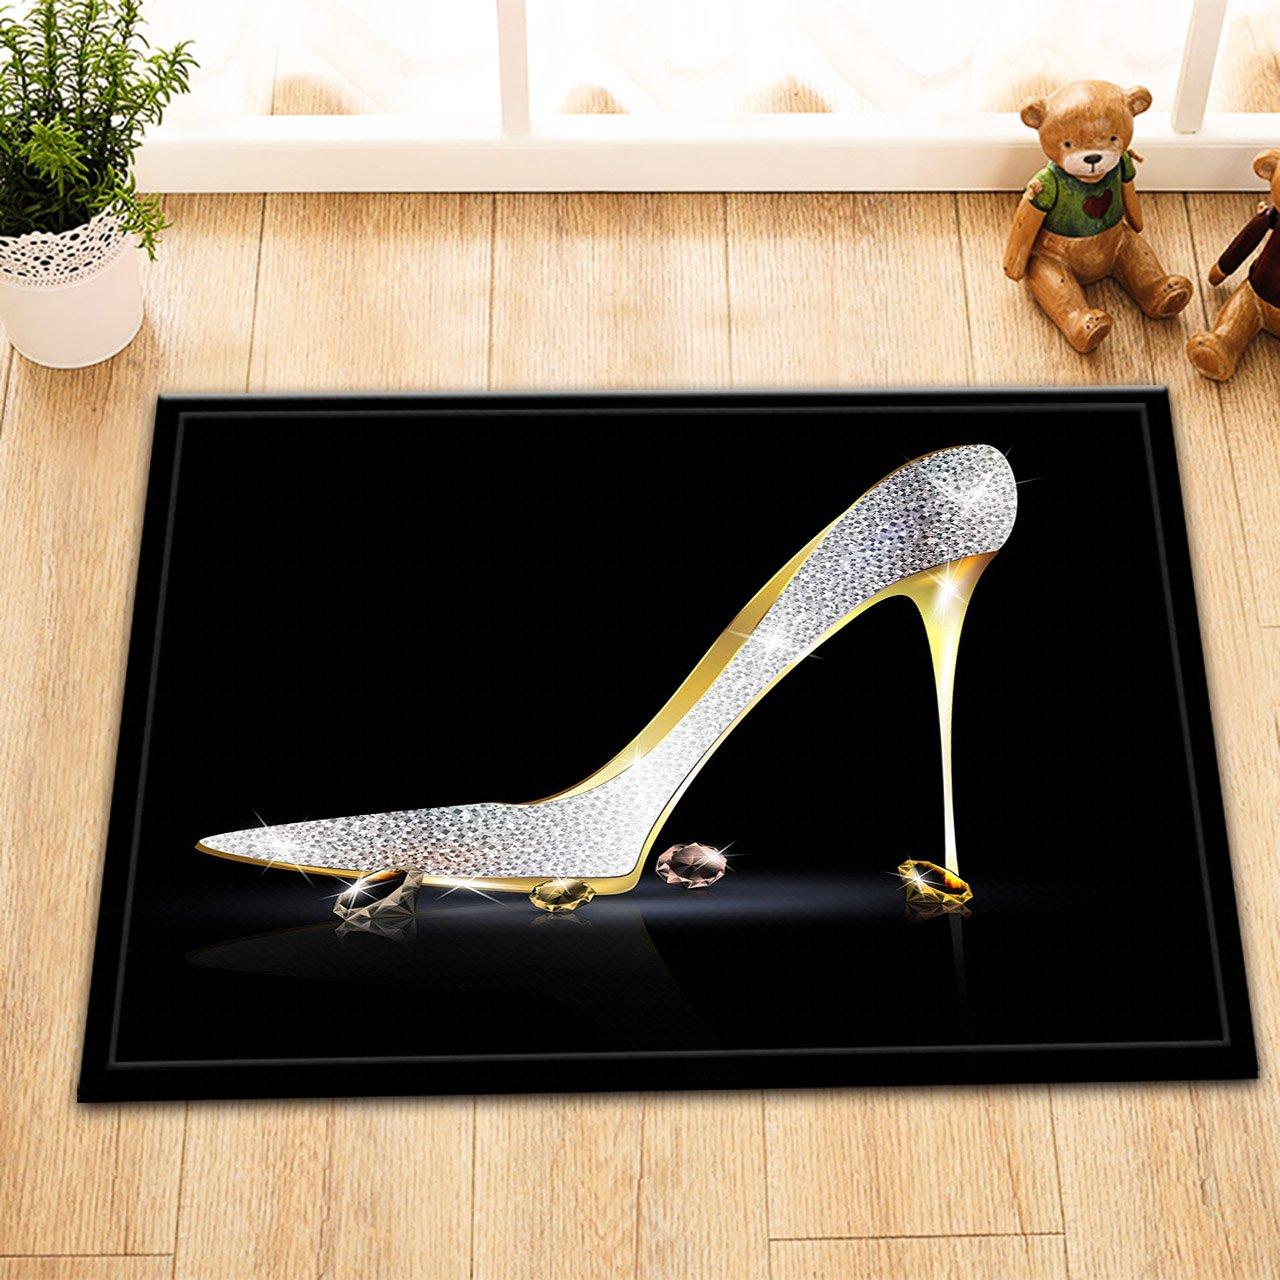 LB Diamond Silver Grey High Heels Bath Mat Modern Fashion Black Bathroom Mat for Girl Non Slip Soft Flannel 16X24 inch